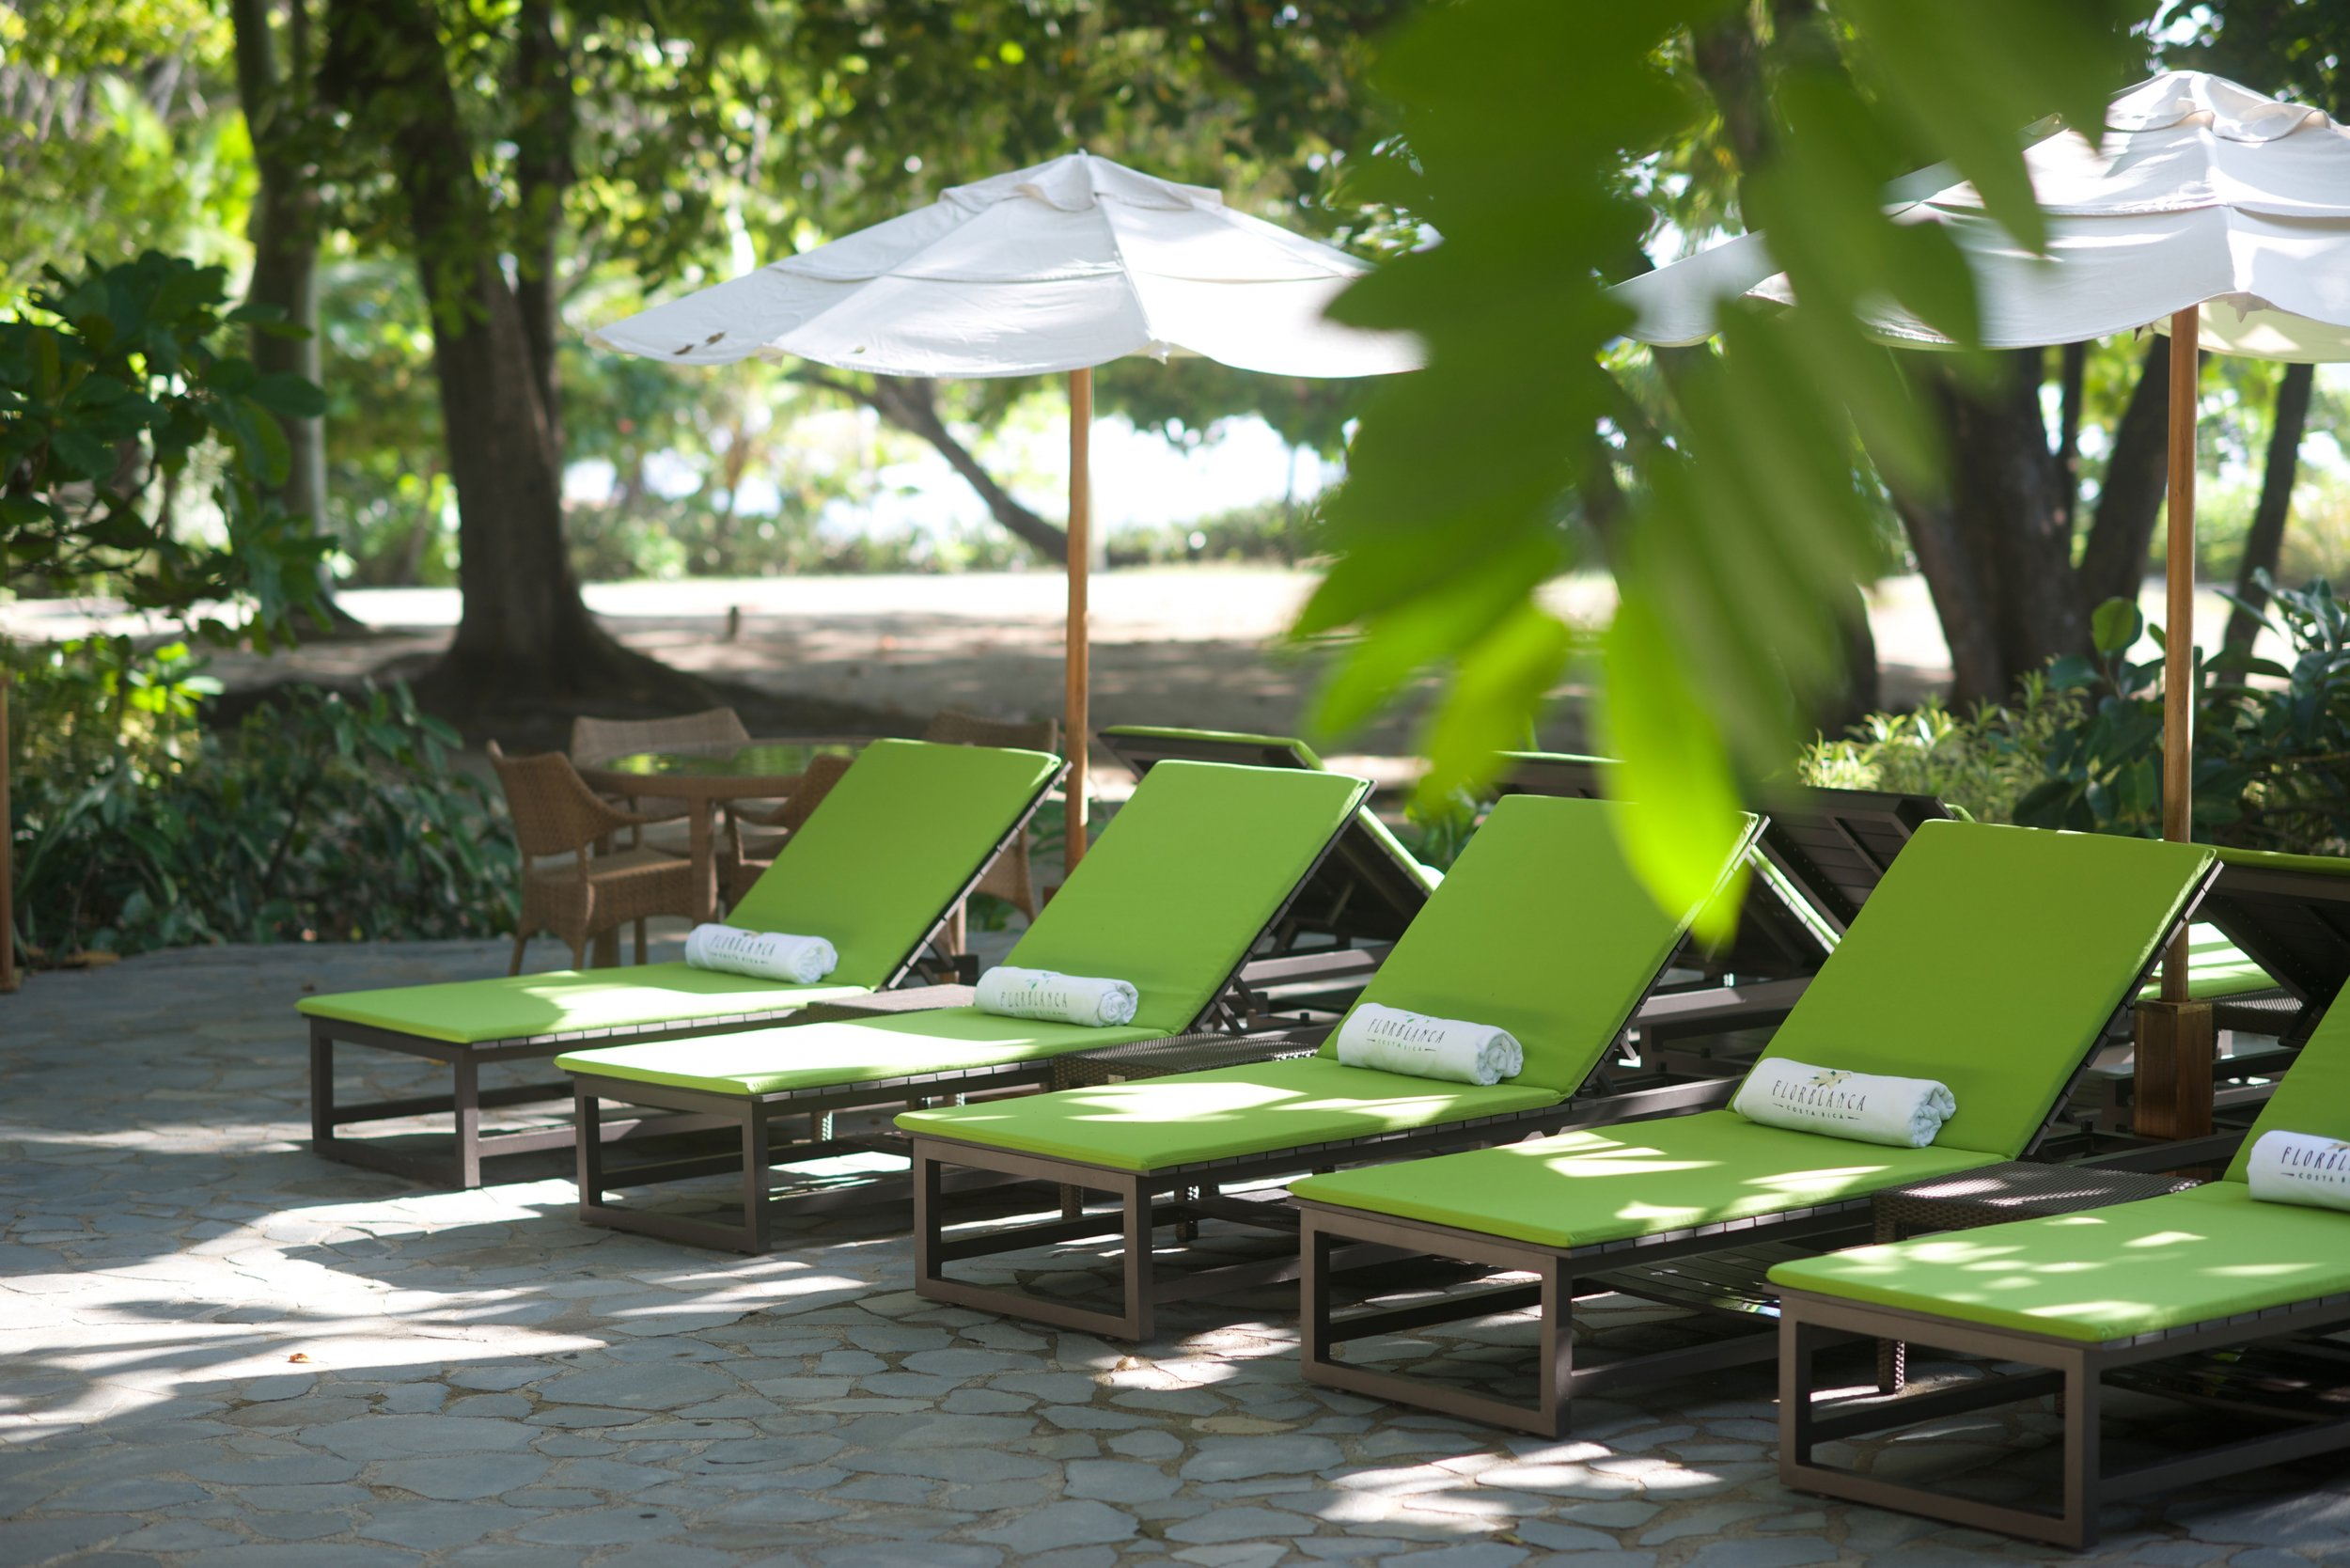 pool-lounging-florblanca (1).jpg